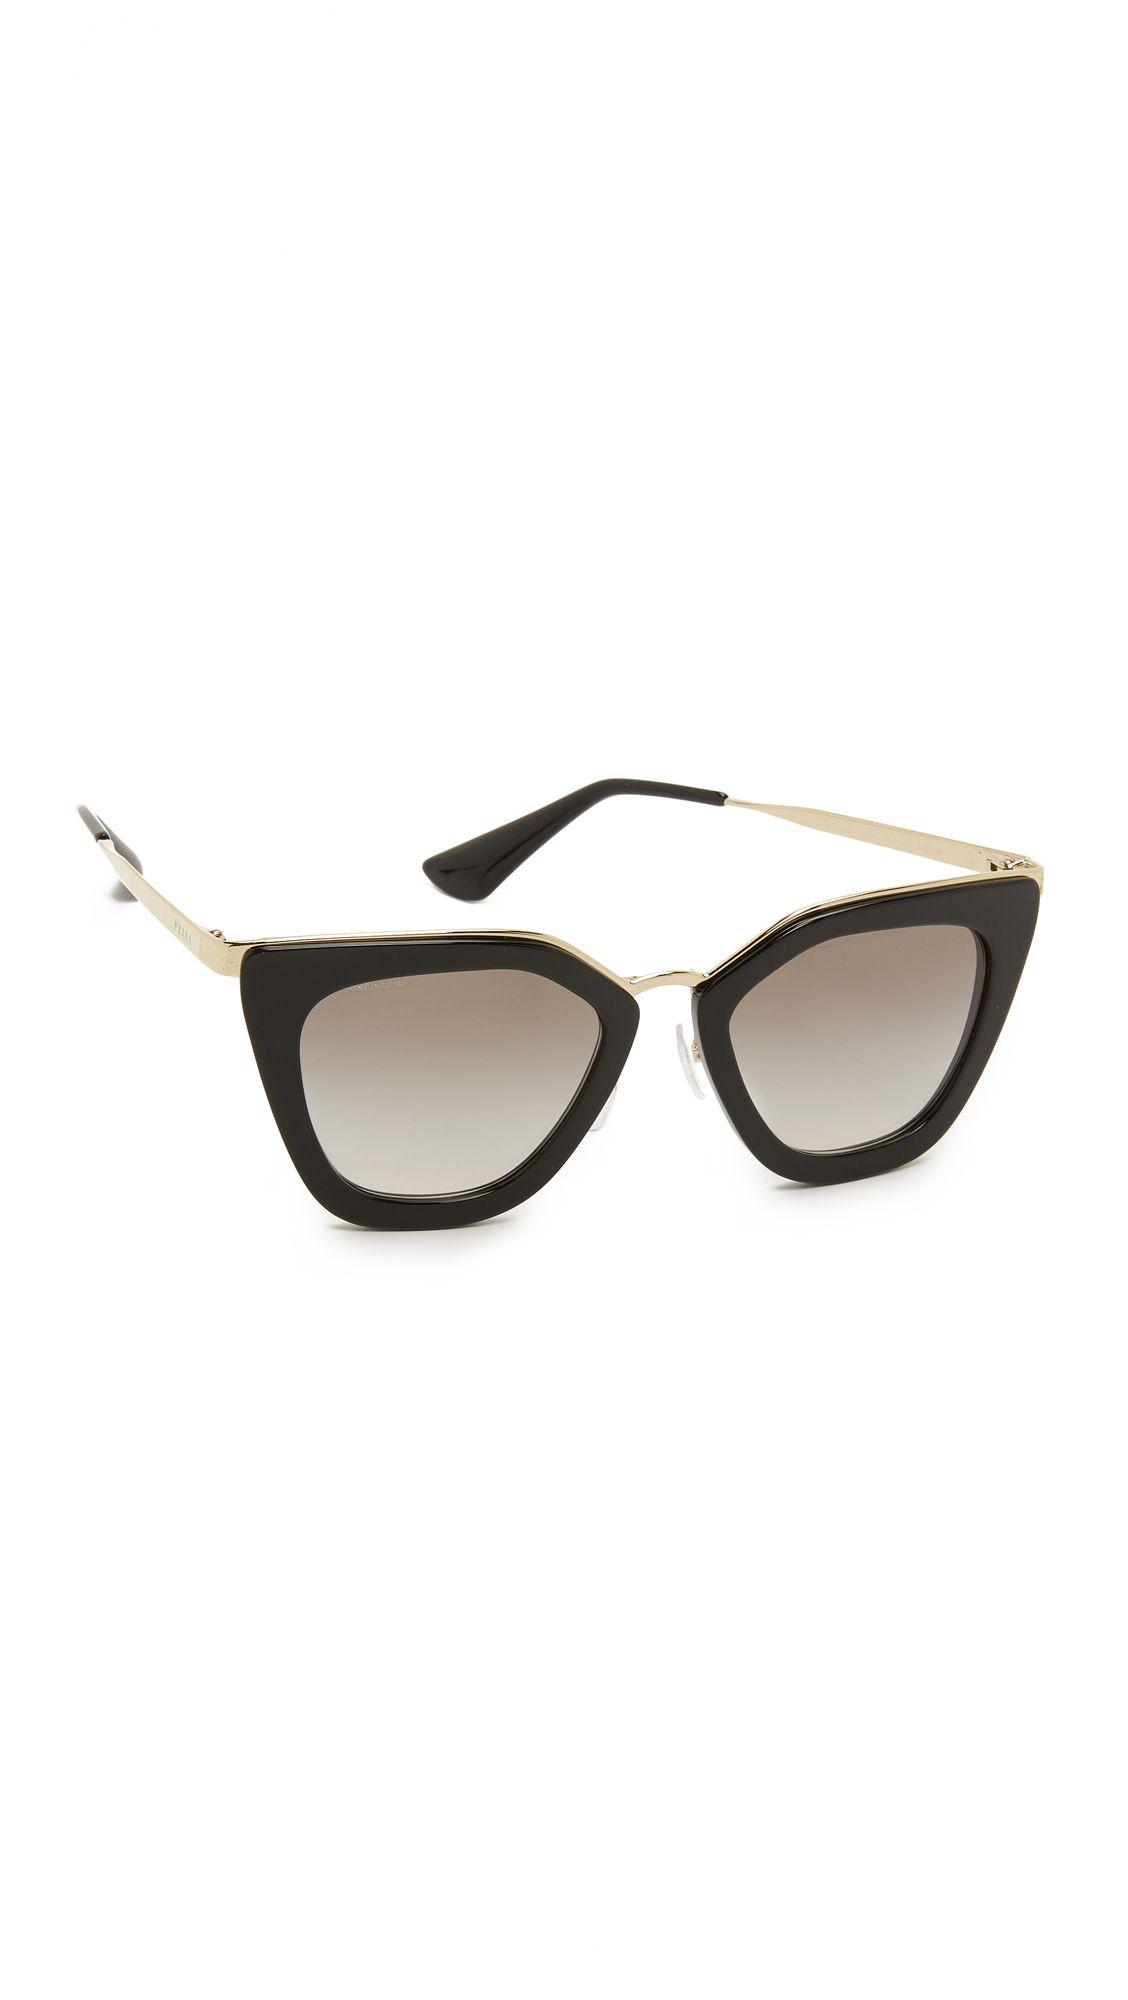 784121ec0124 womensbeuaty #Fashion Prada Thick Frame Sunglasses in Black Lyst ...